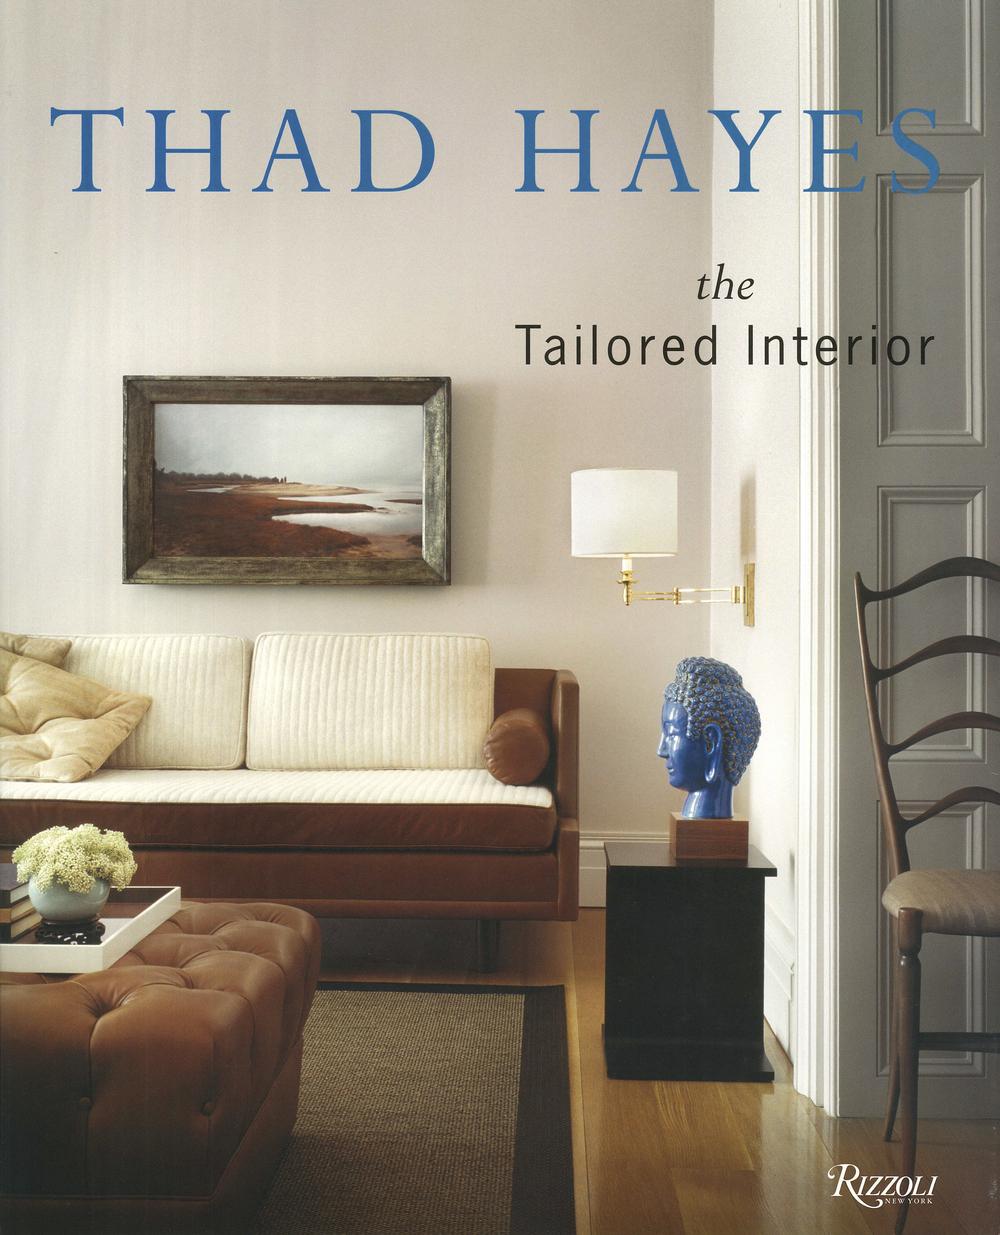 Thad Hayes.jpg